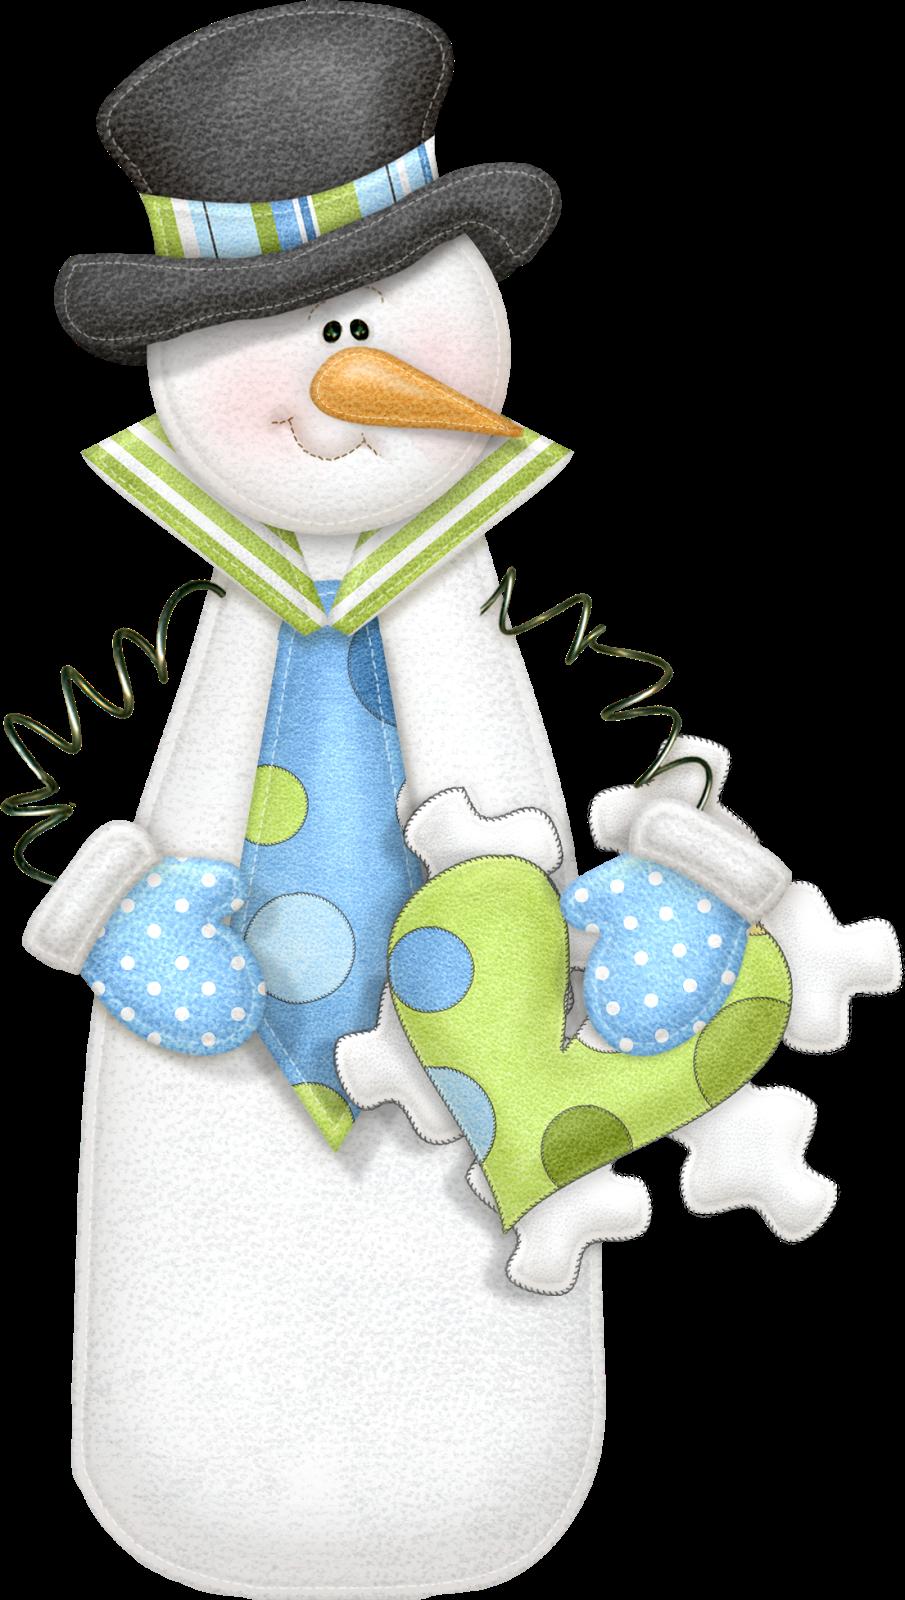 Sgblogosfera mar a jos. Clipart snowman friends